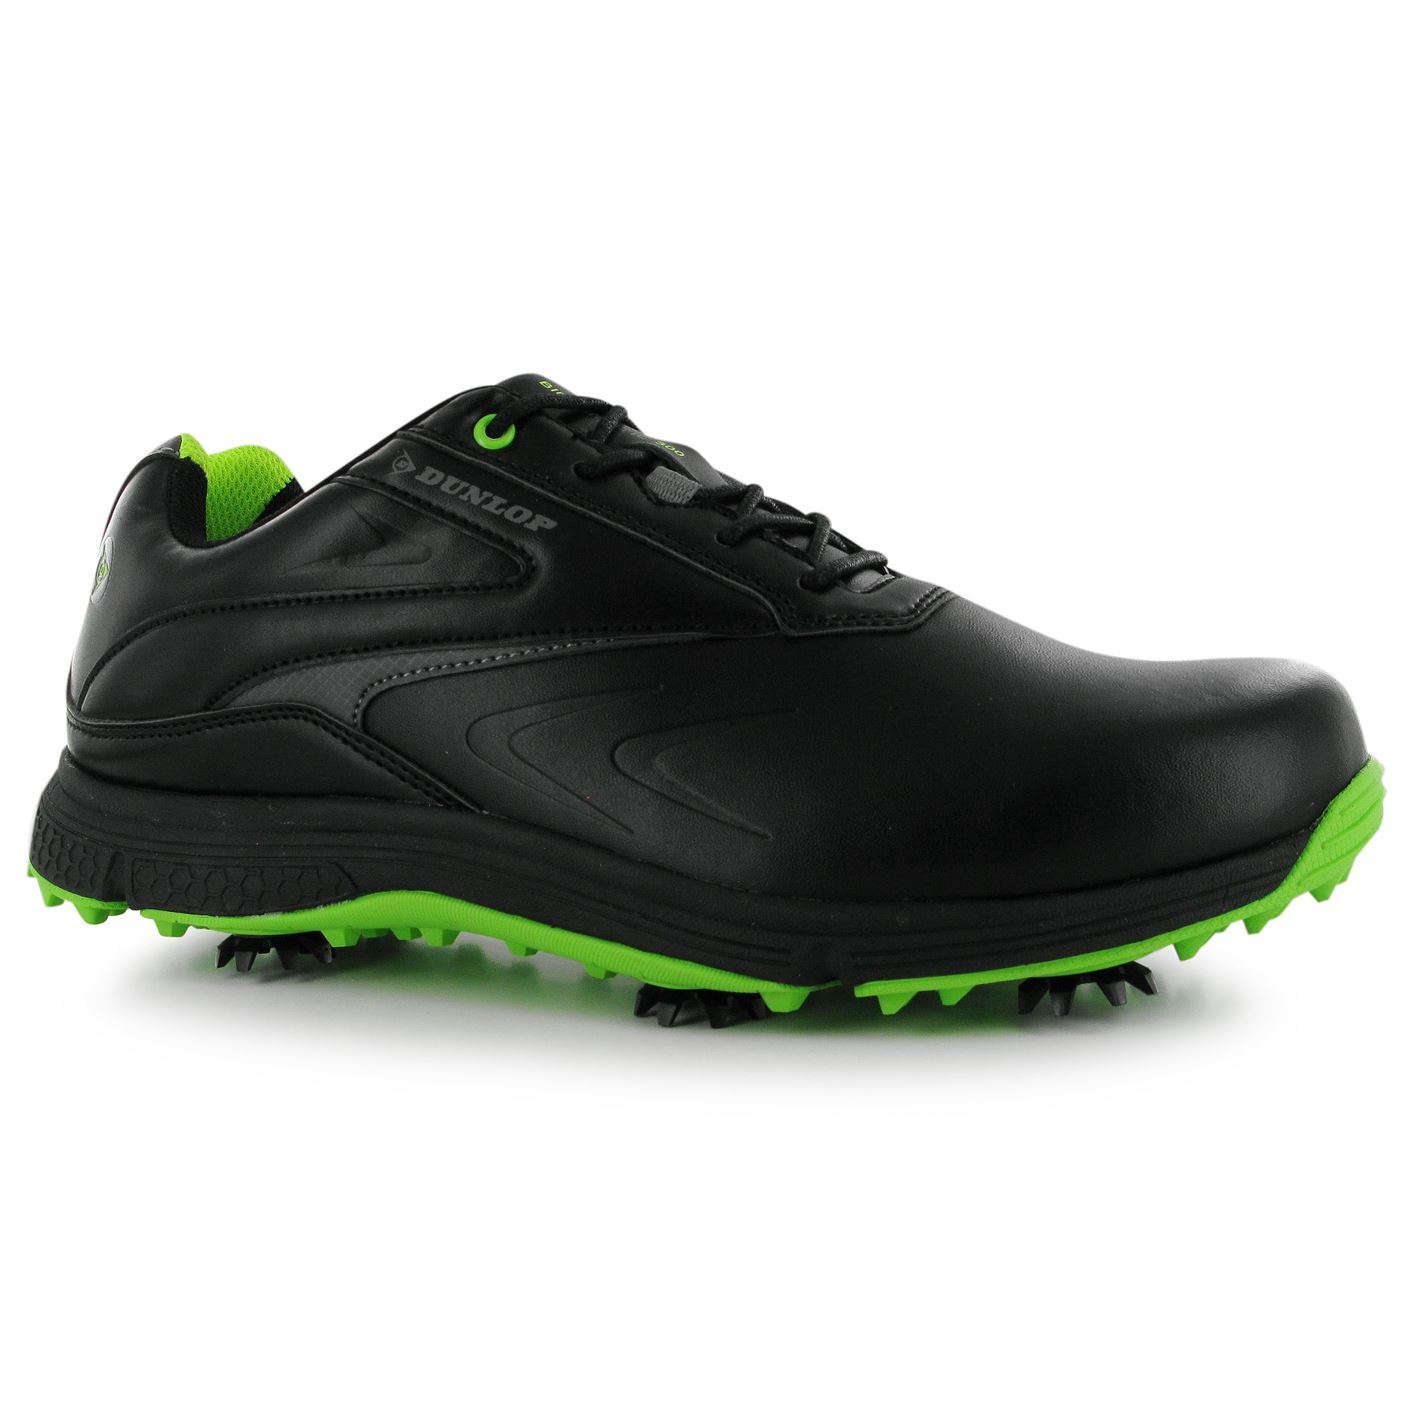 Dunlop Classic Golf Shoes Cleats